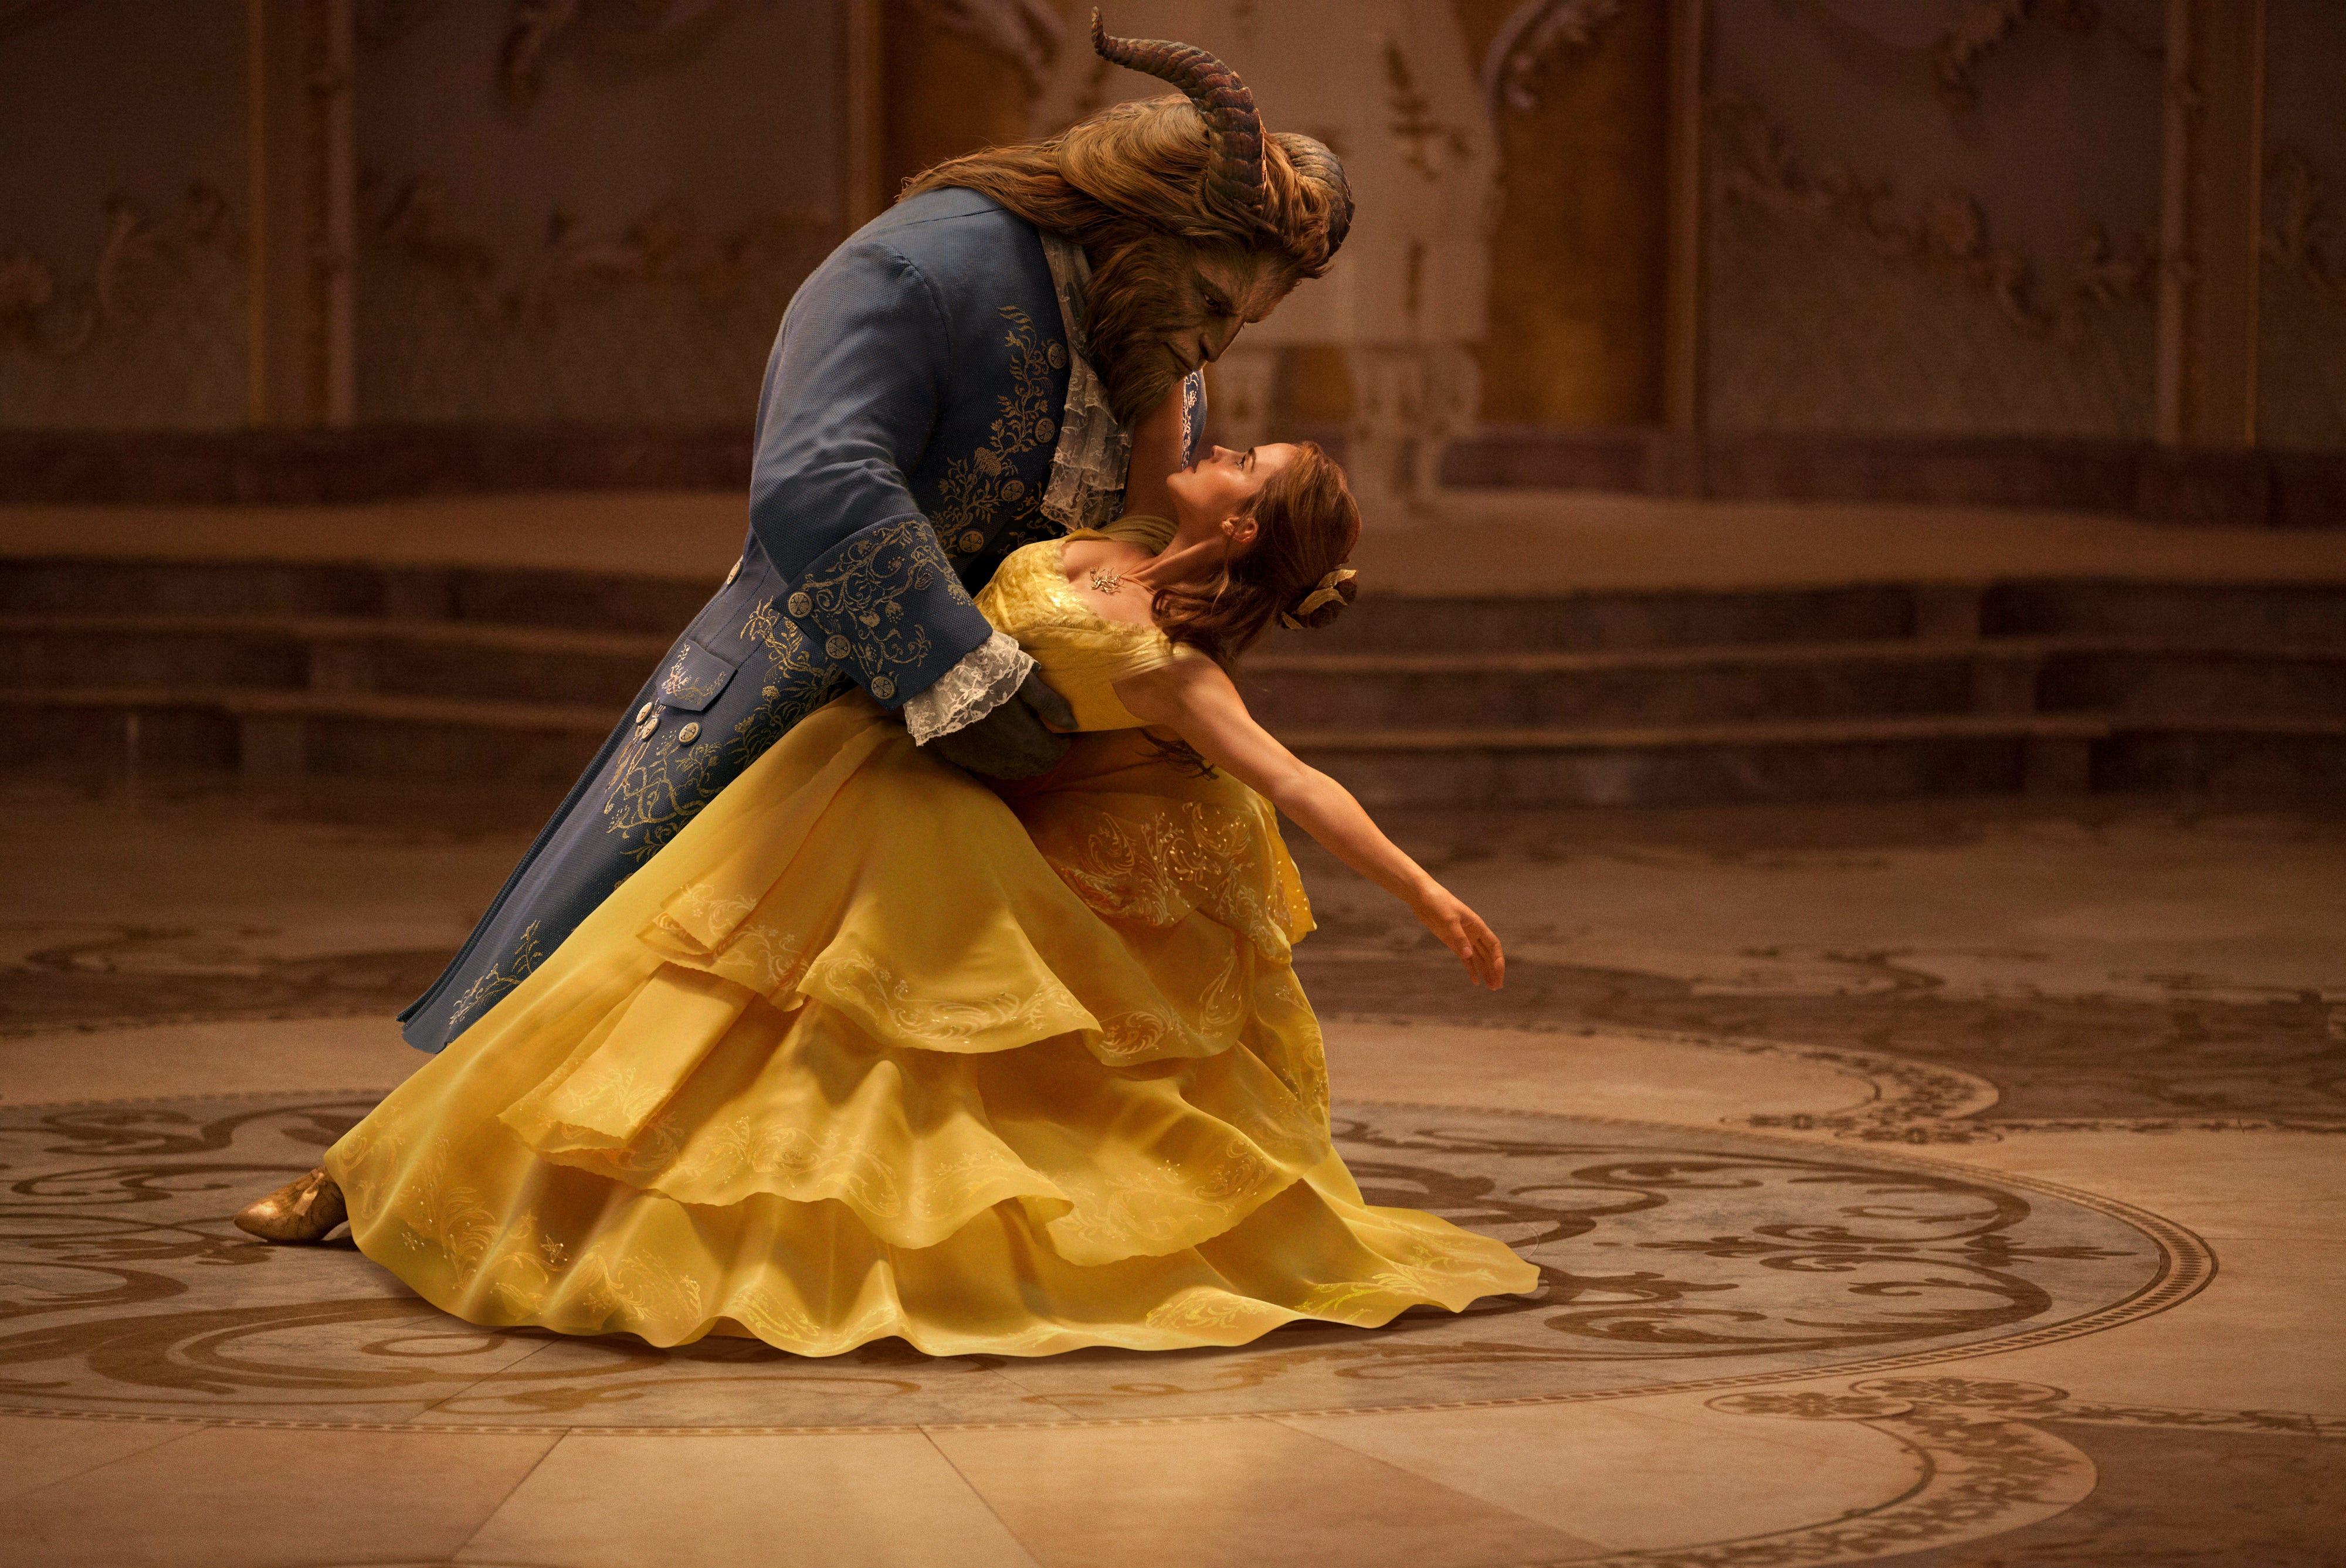 The Beast (Dan Stevens) and Belle (Emma Watson) share